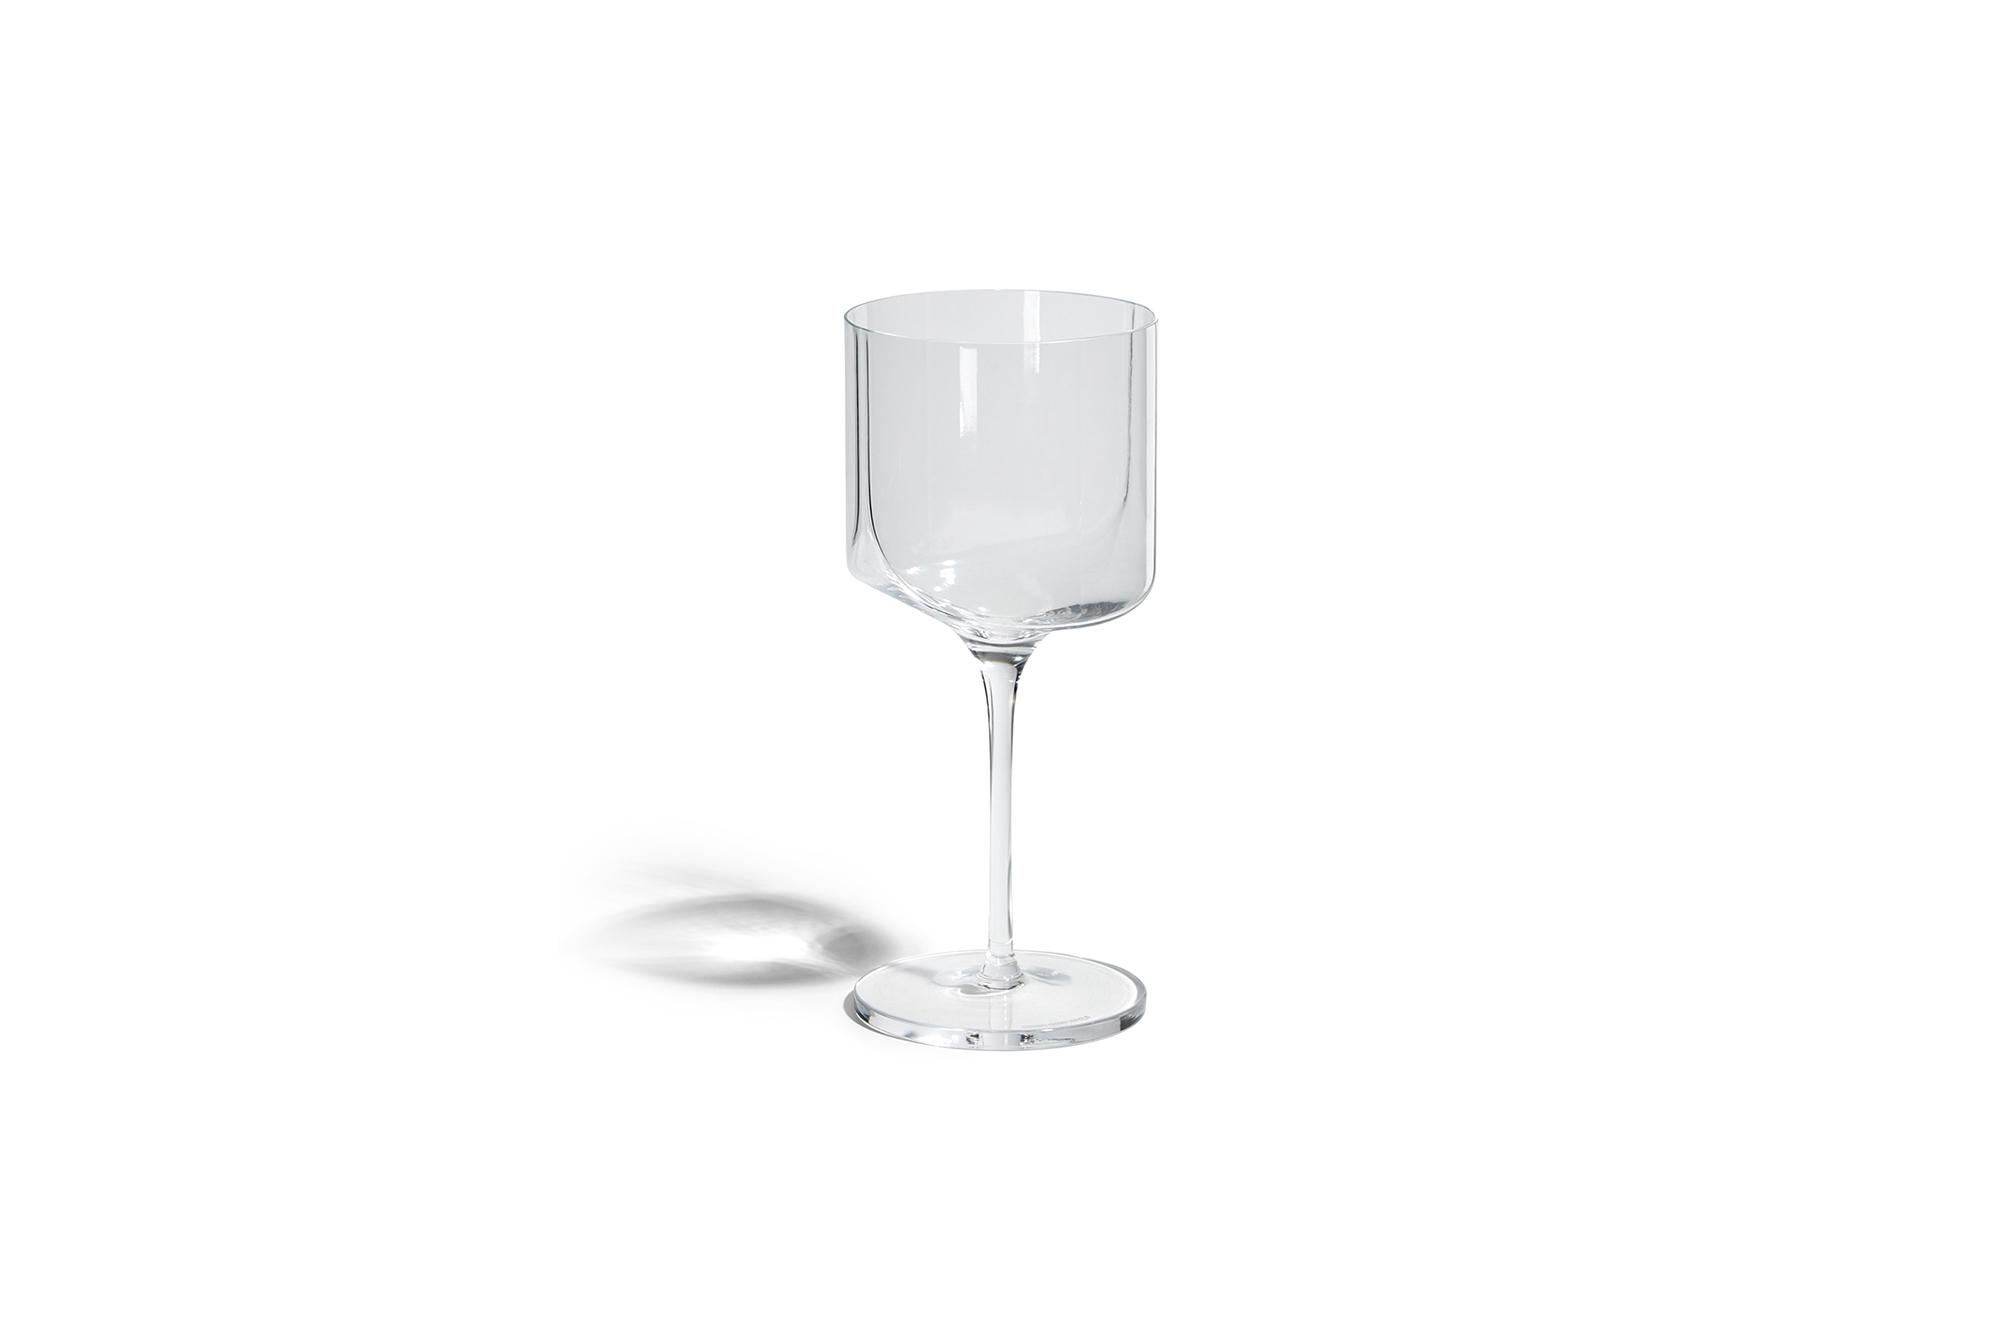 Hew Wine Glass Set of 2